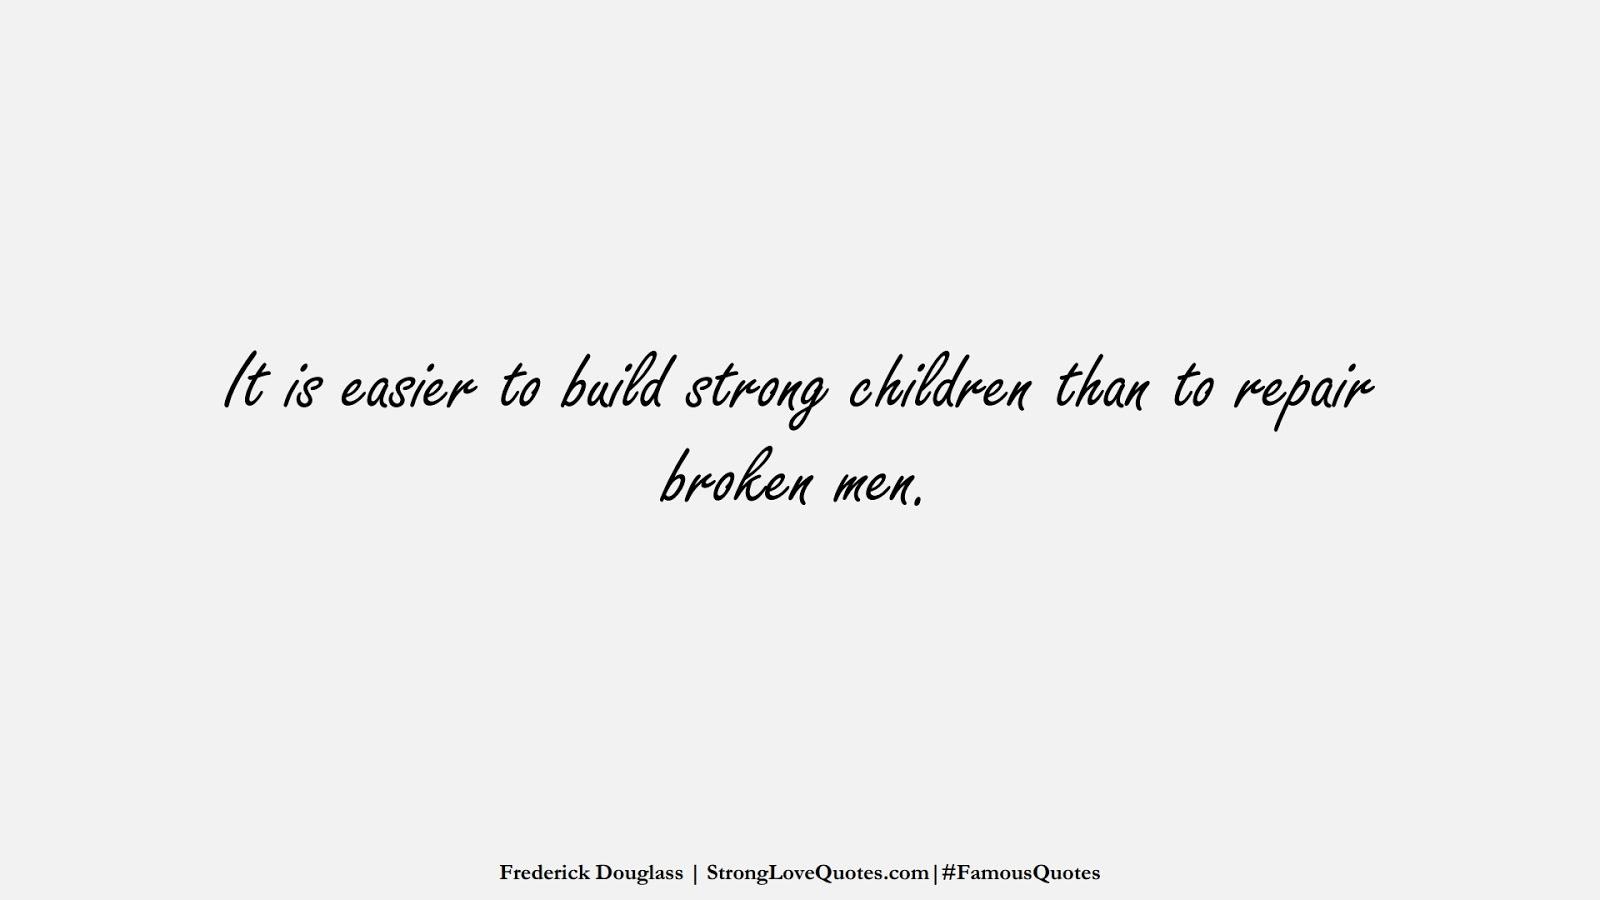 It is easier to build strong children than to repair broken men. (Frederick Douglass);  #FamousQuotes